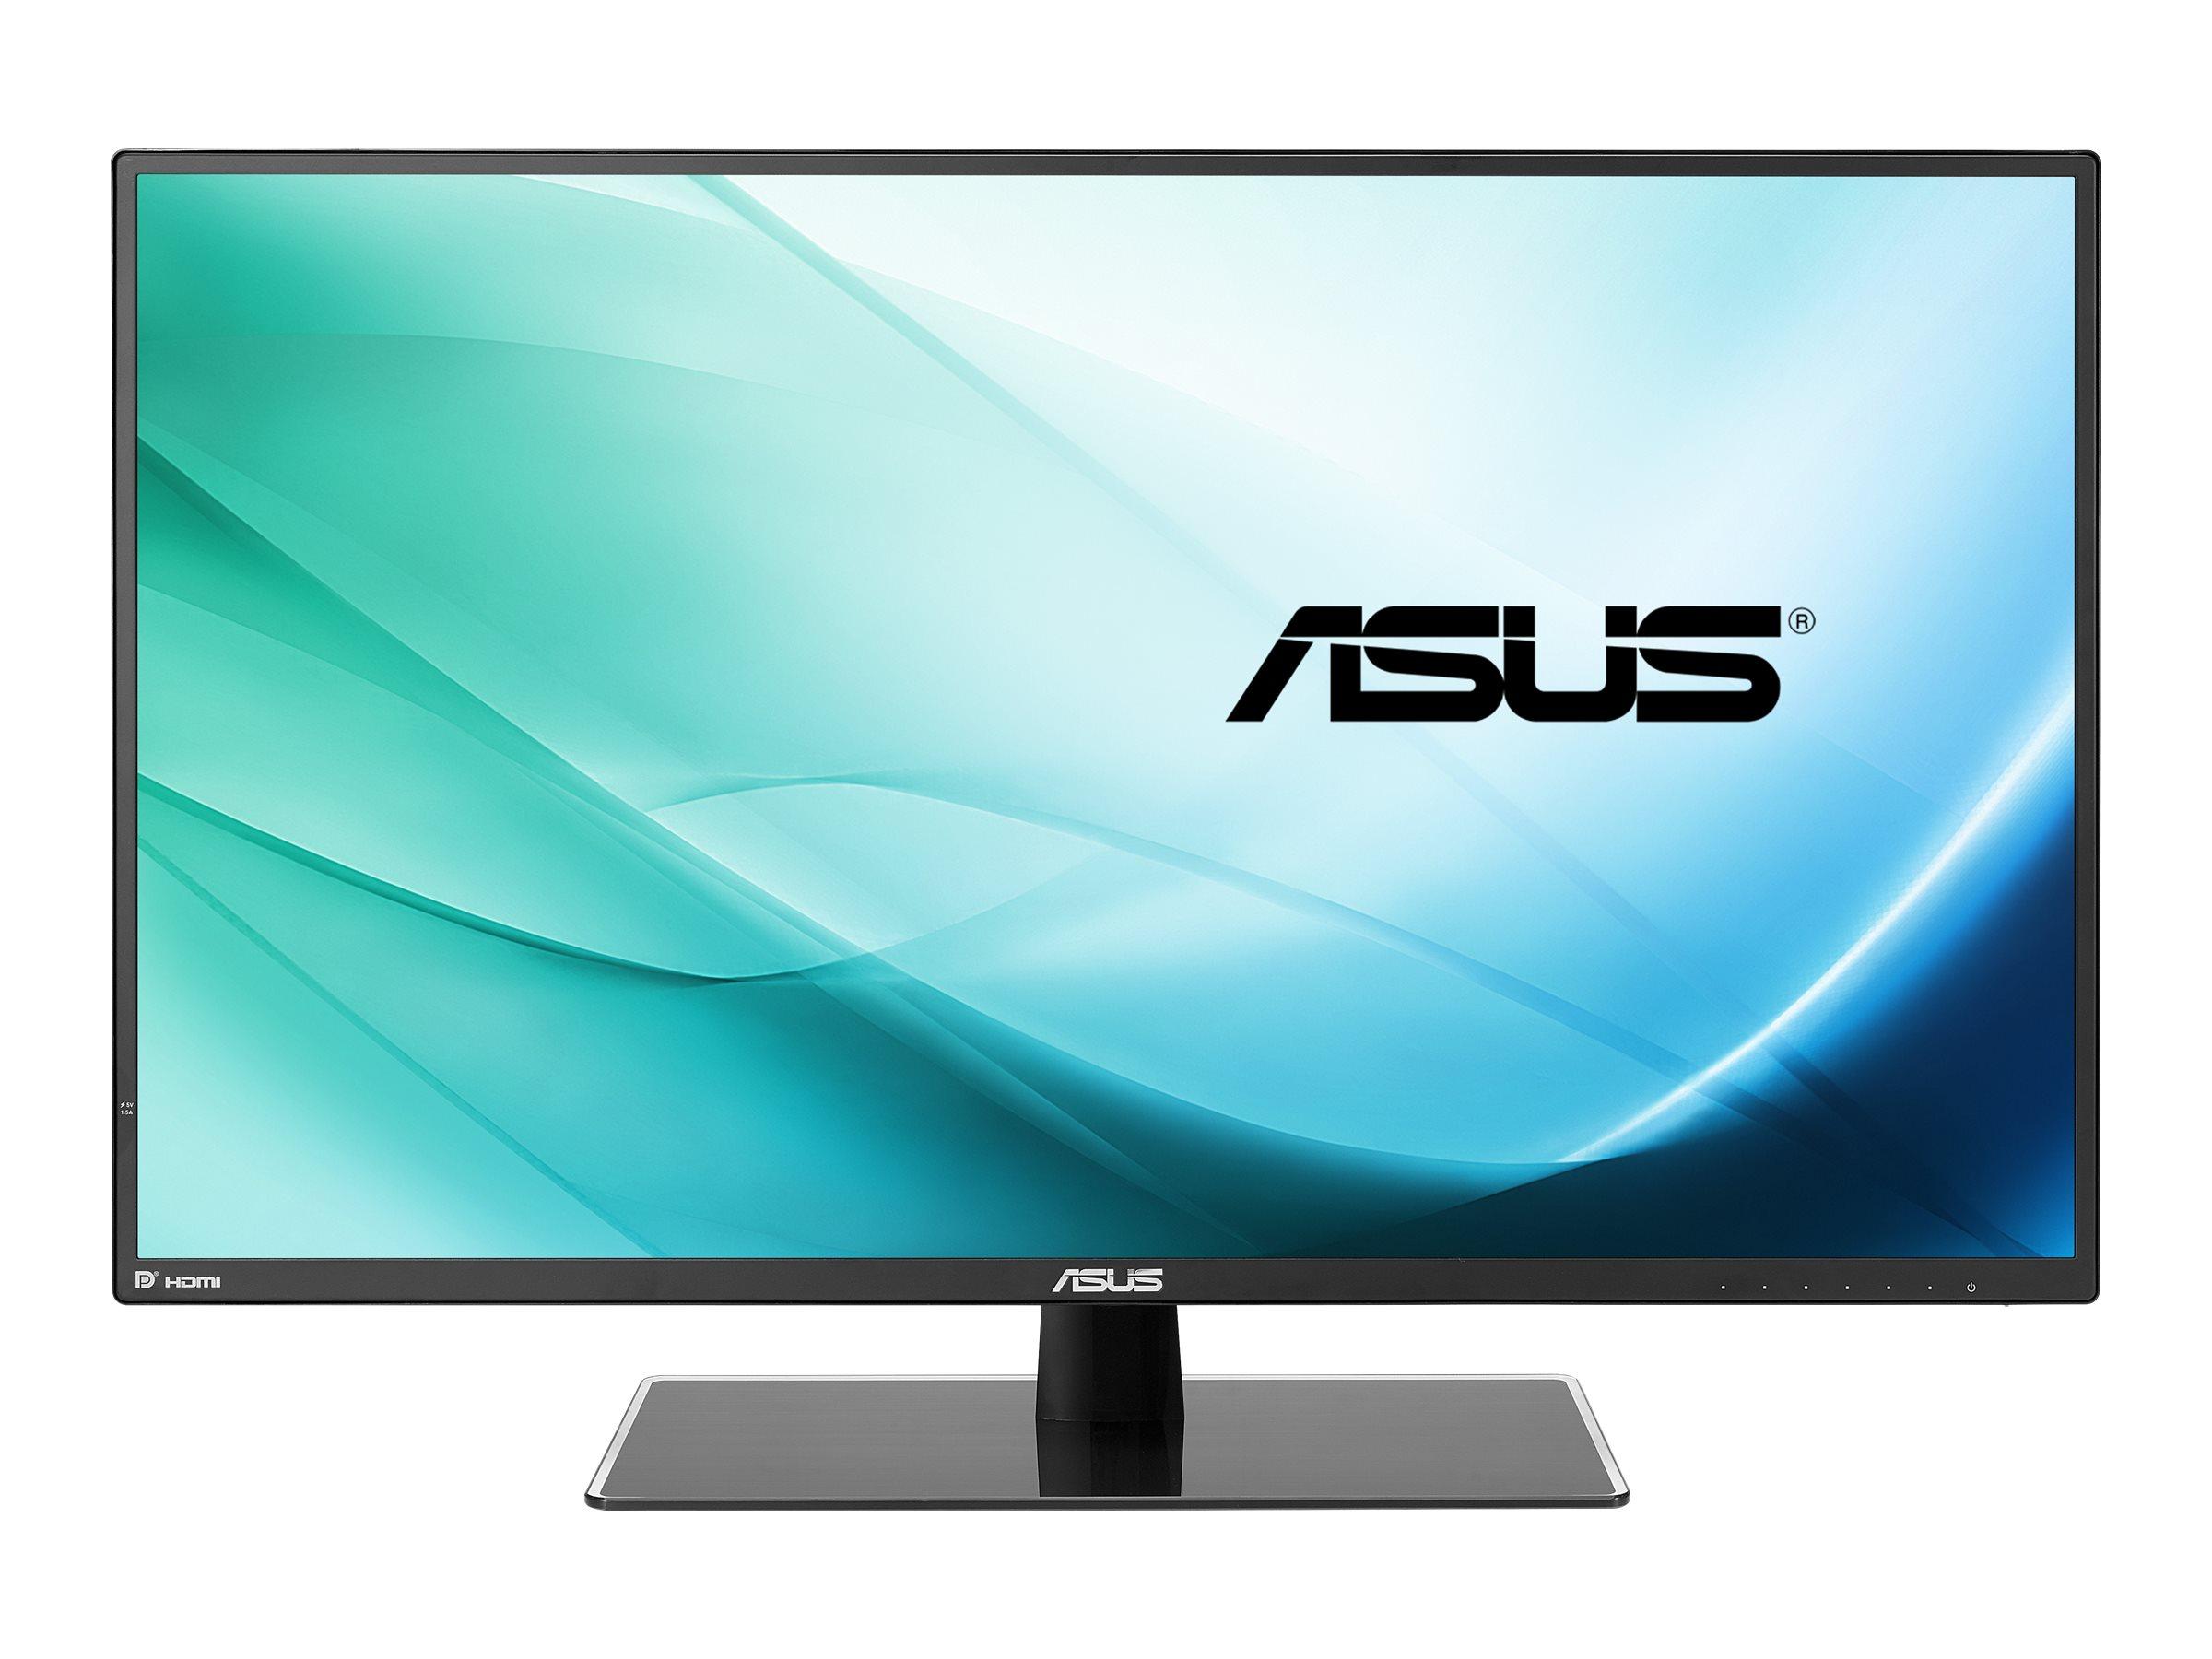 ASUS VA32AQ - LED-Monitor - 80.1 cm (31.5